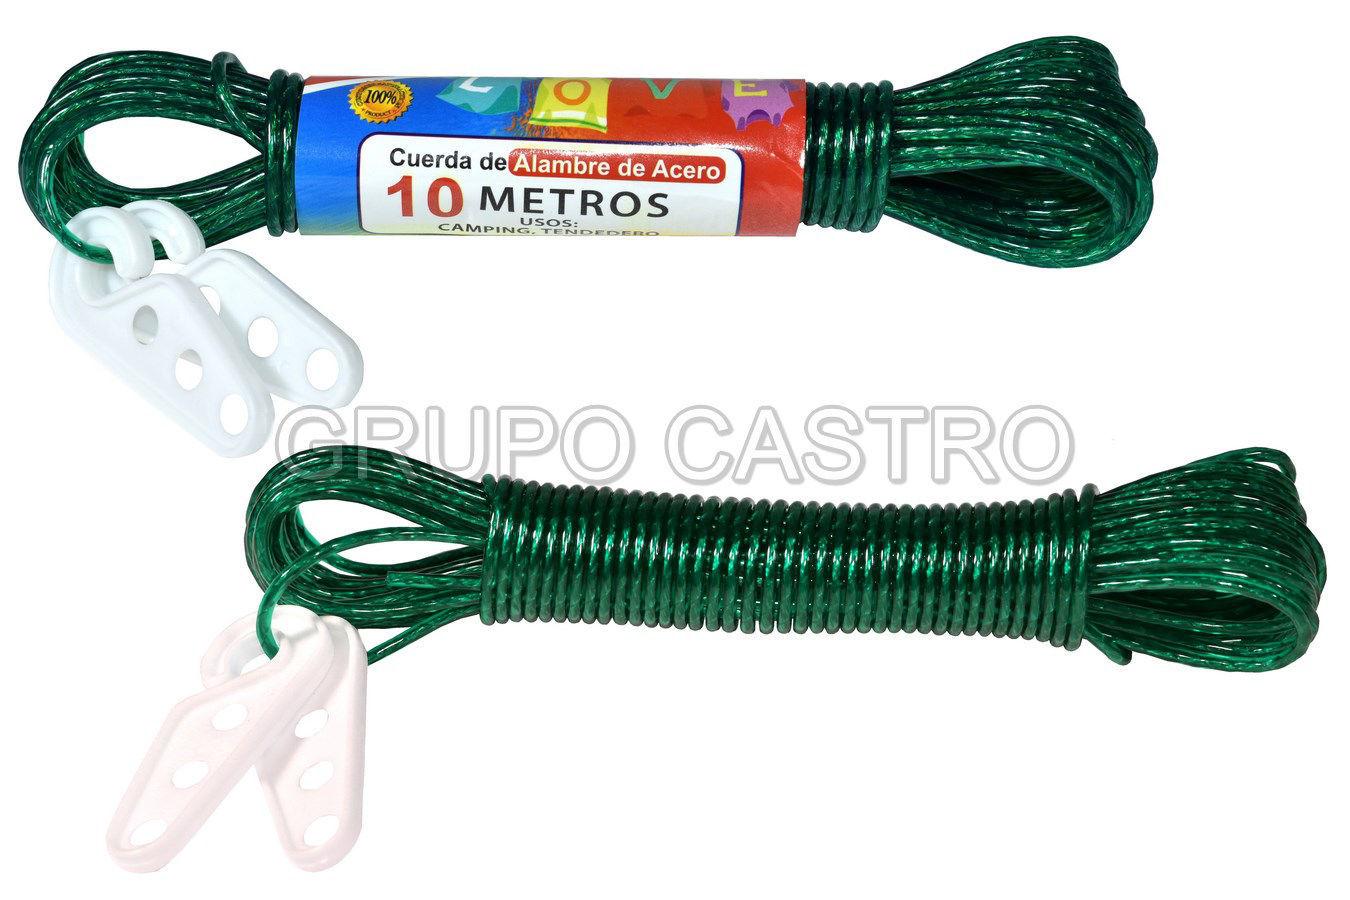 Foto de Mecate para tendedero/camping10Mtrs x4MM HG-3060 daily